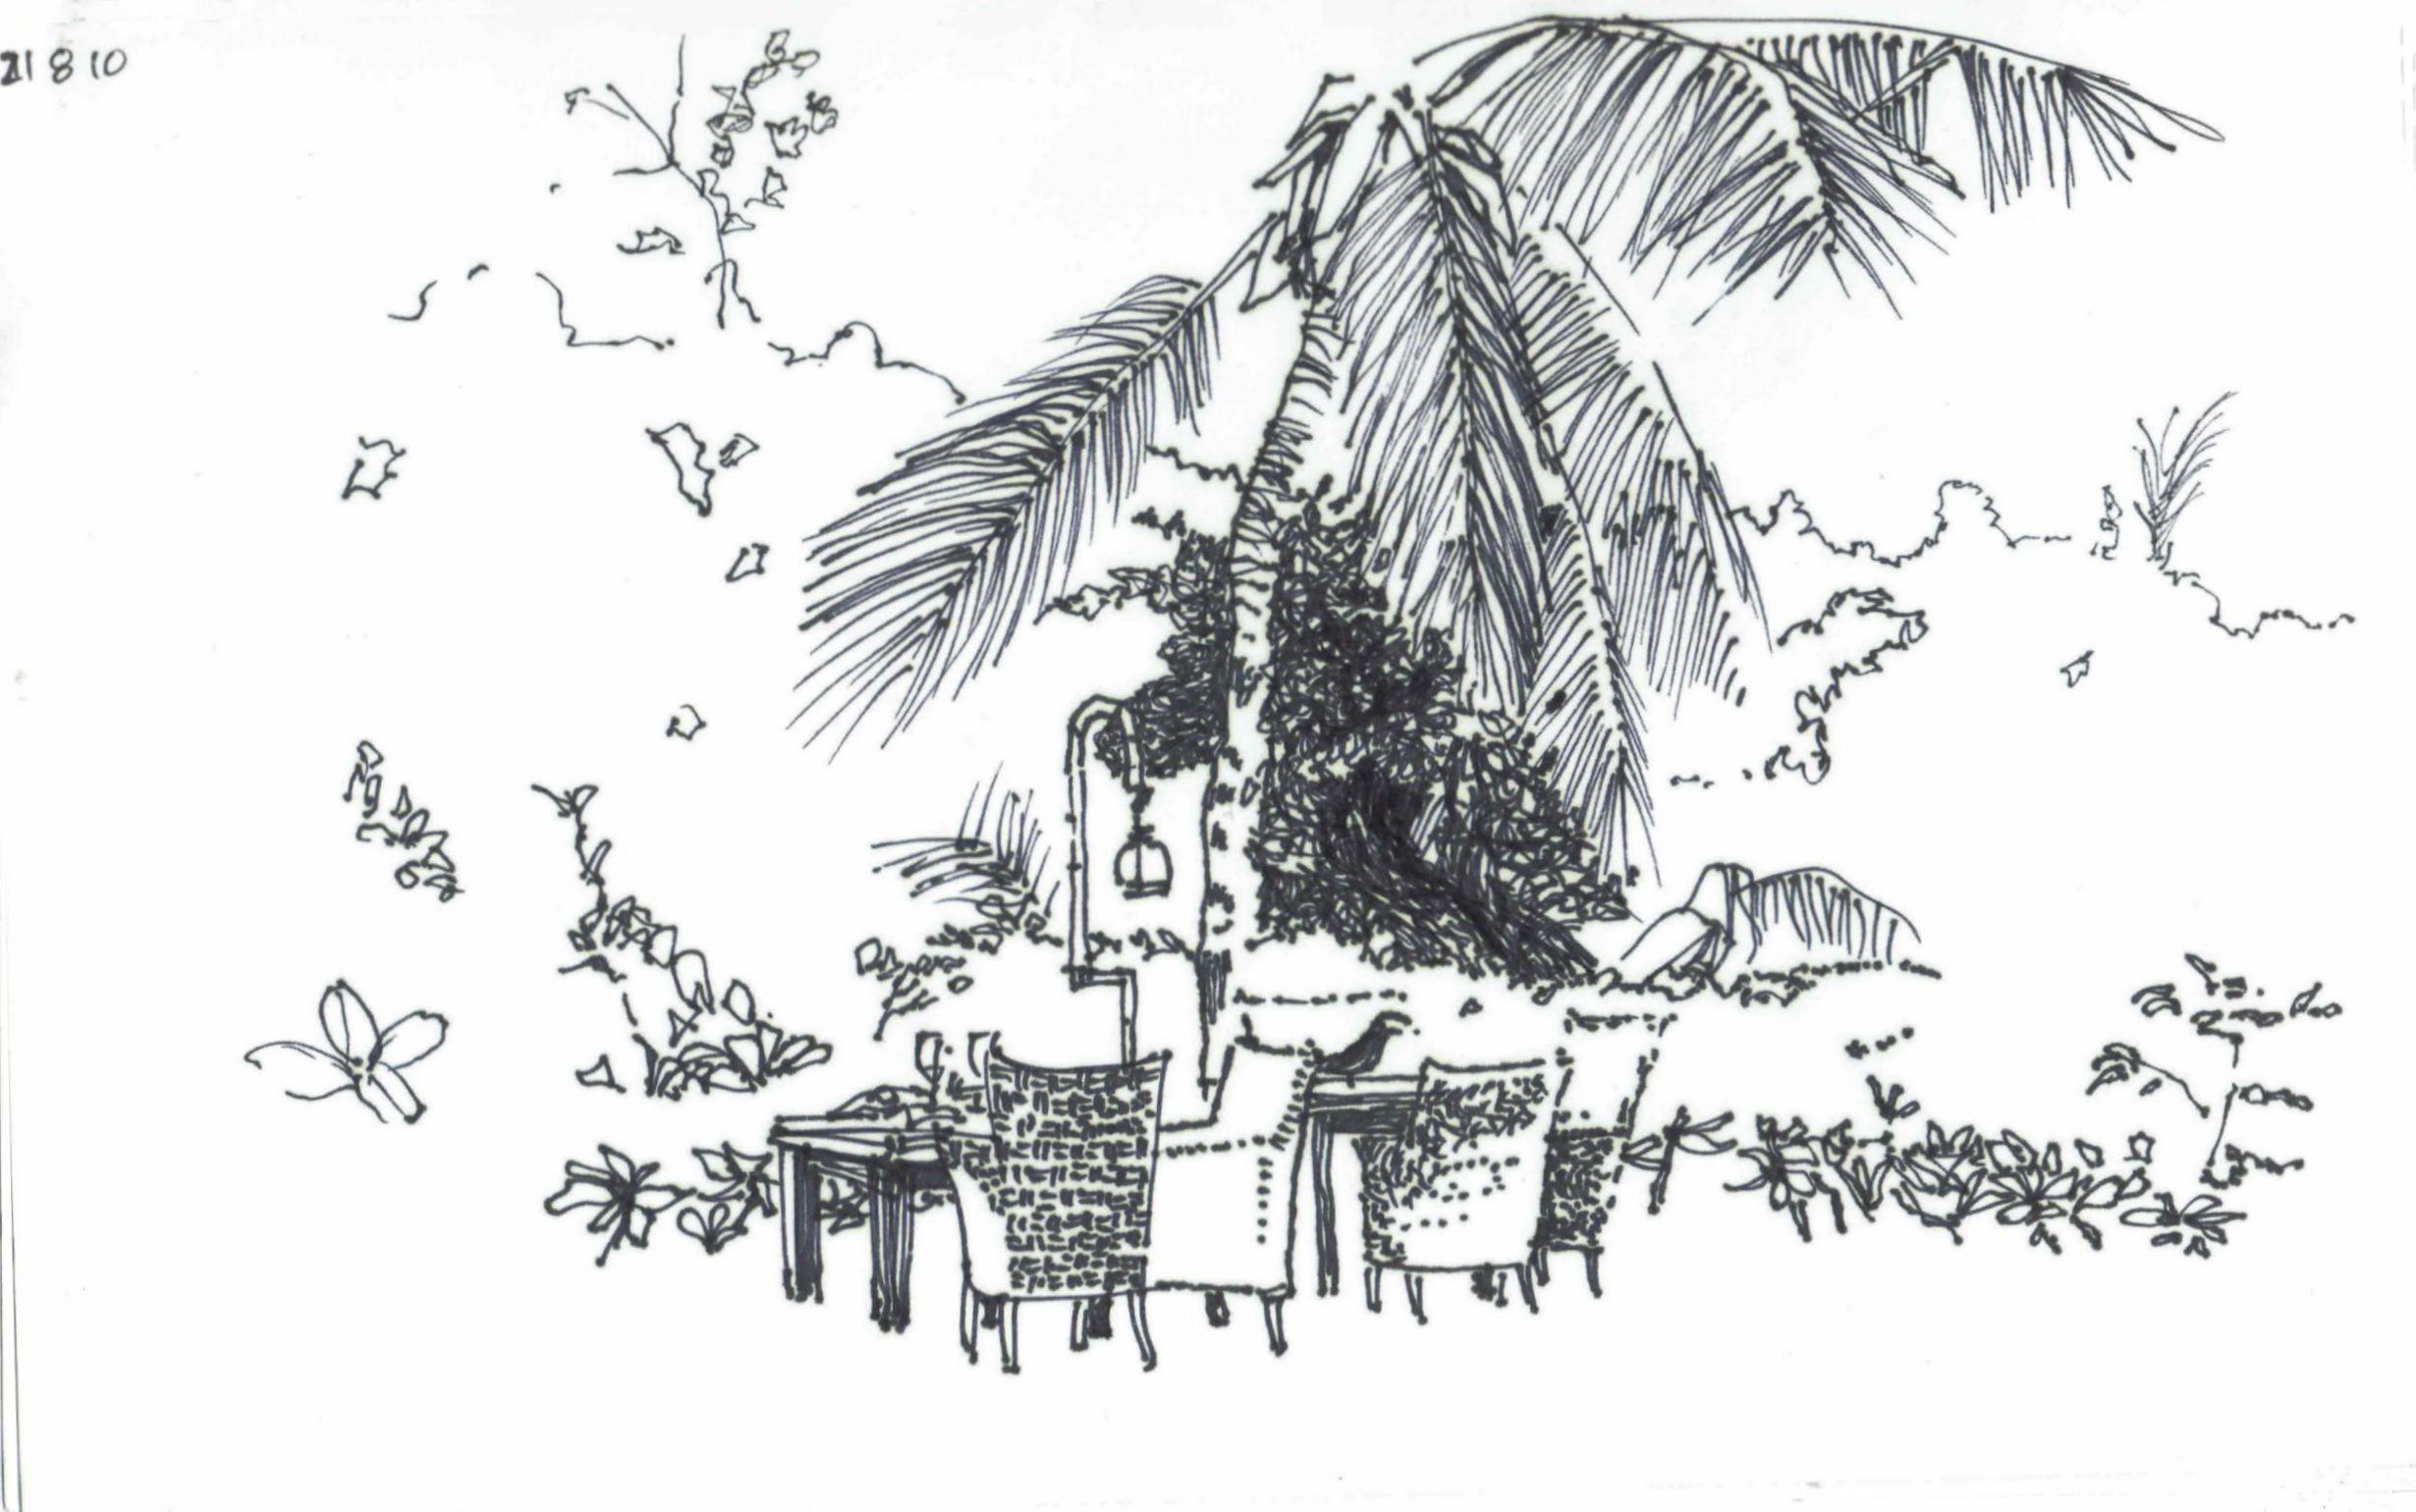 20100821 Seychelles 01.JPG